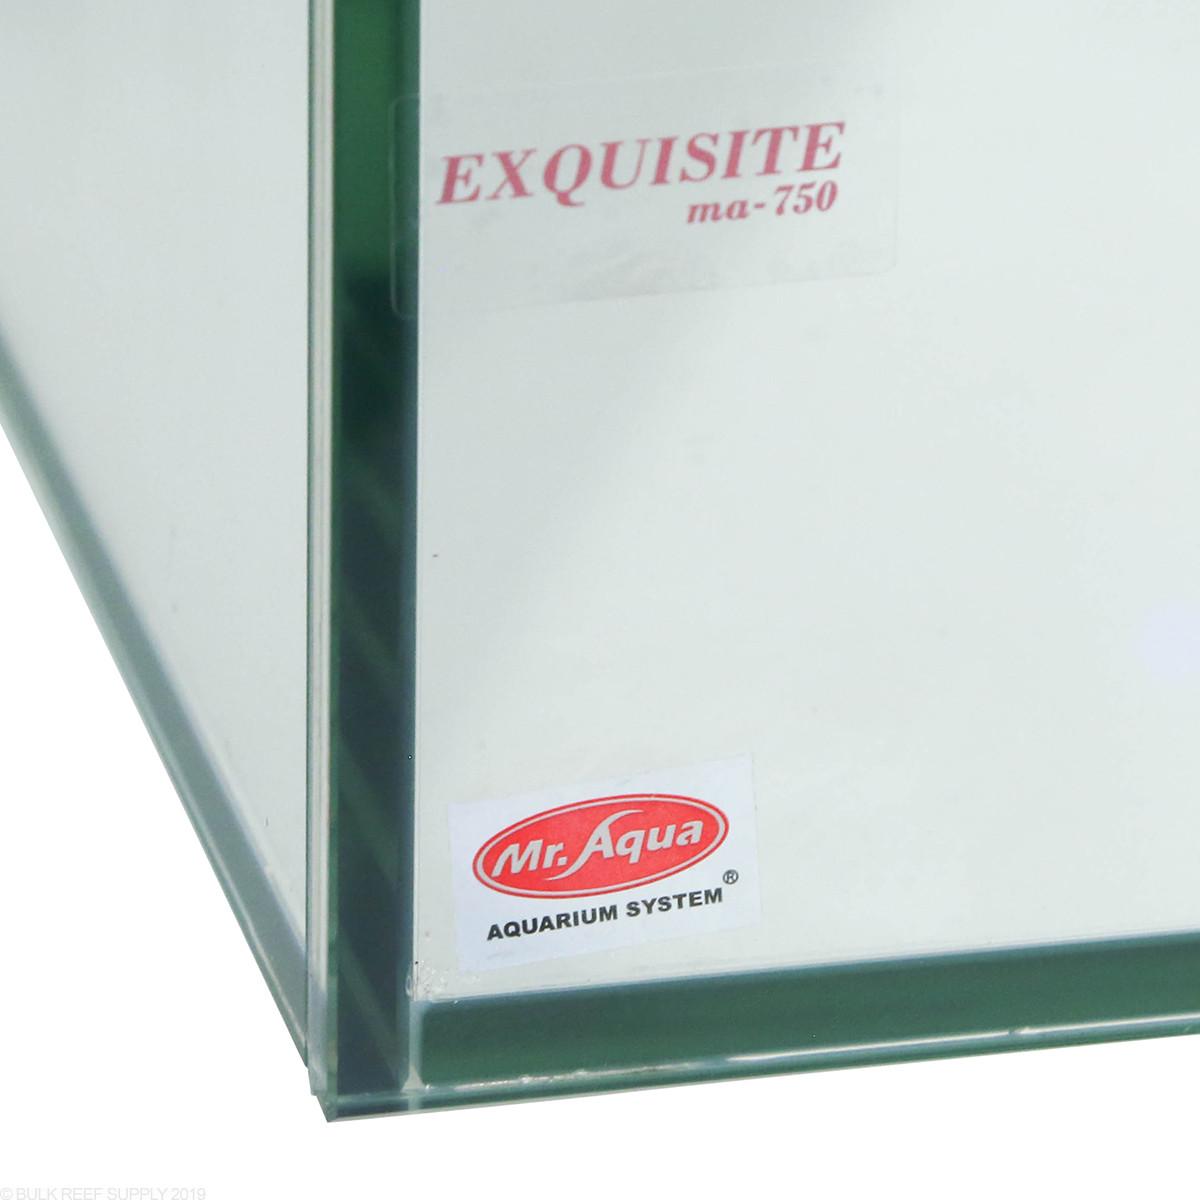 22 Gallon Exquisite Rimless Tank - Standard Glass